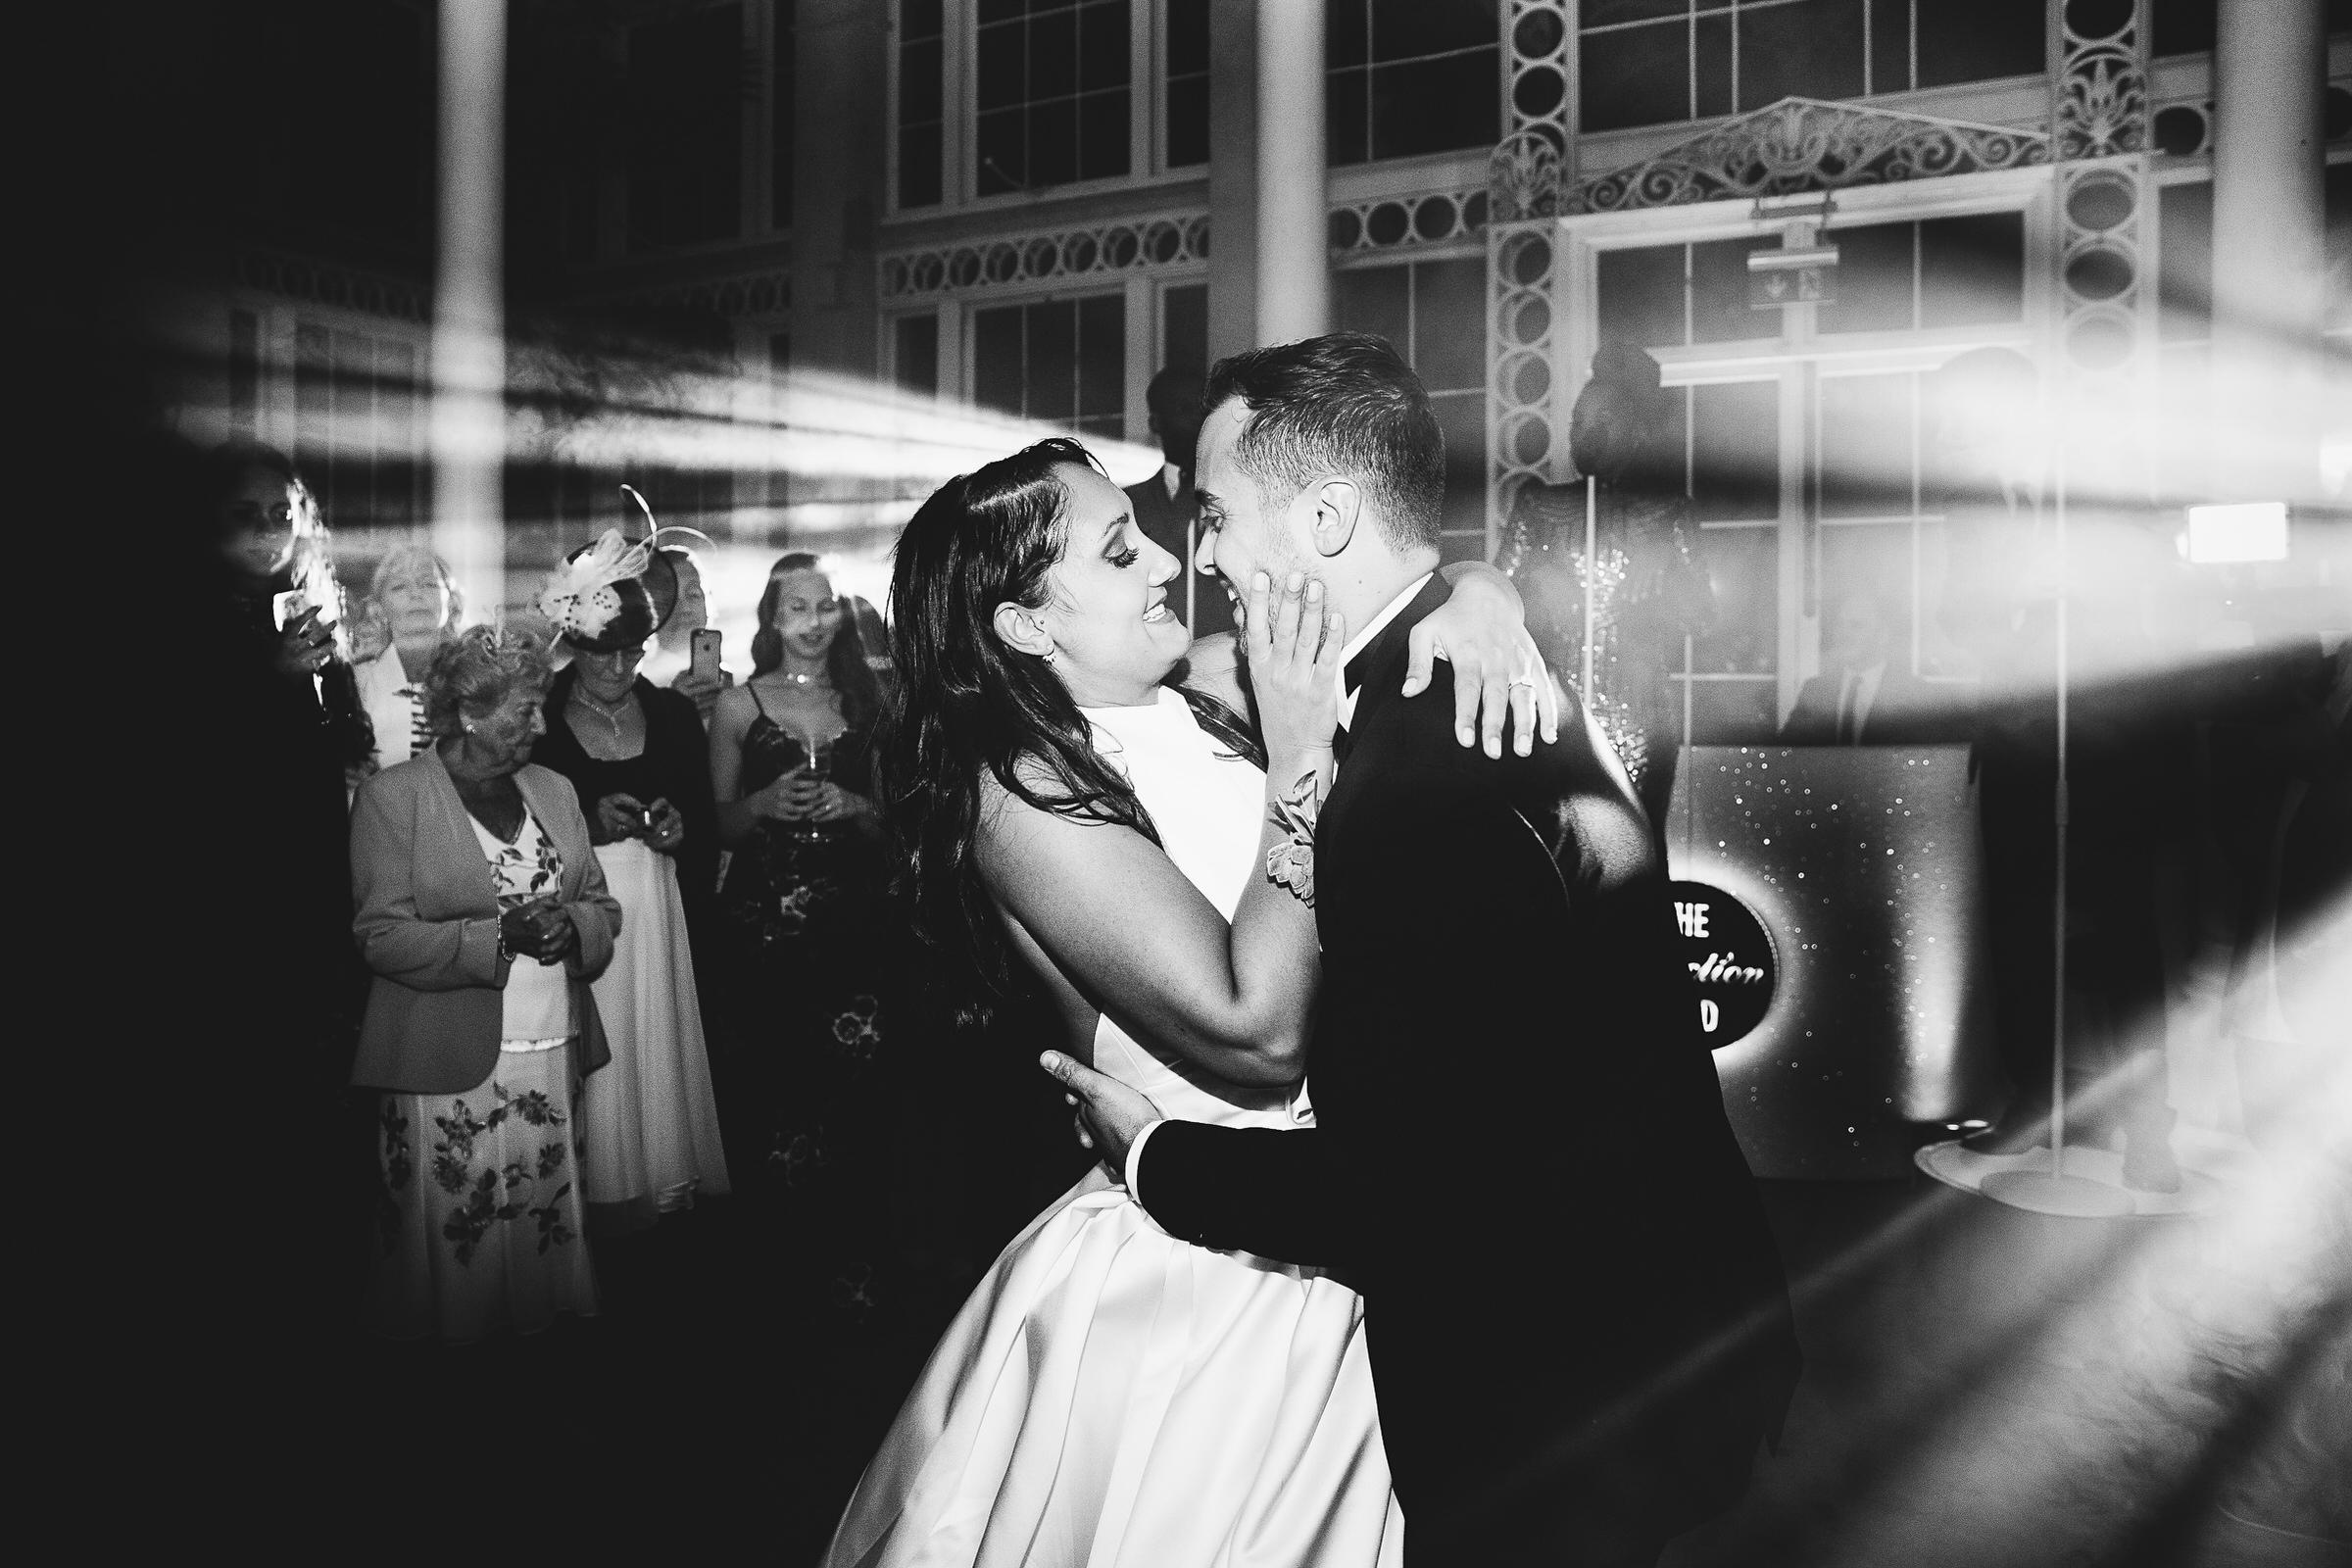 Syon Park wedding - Natalie & Dan